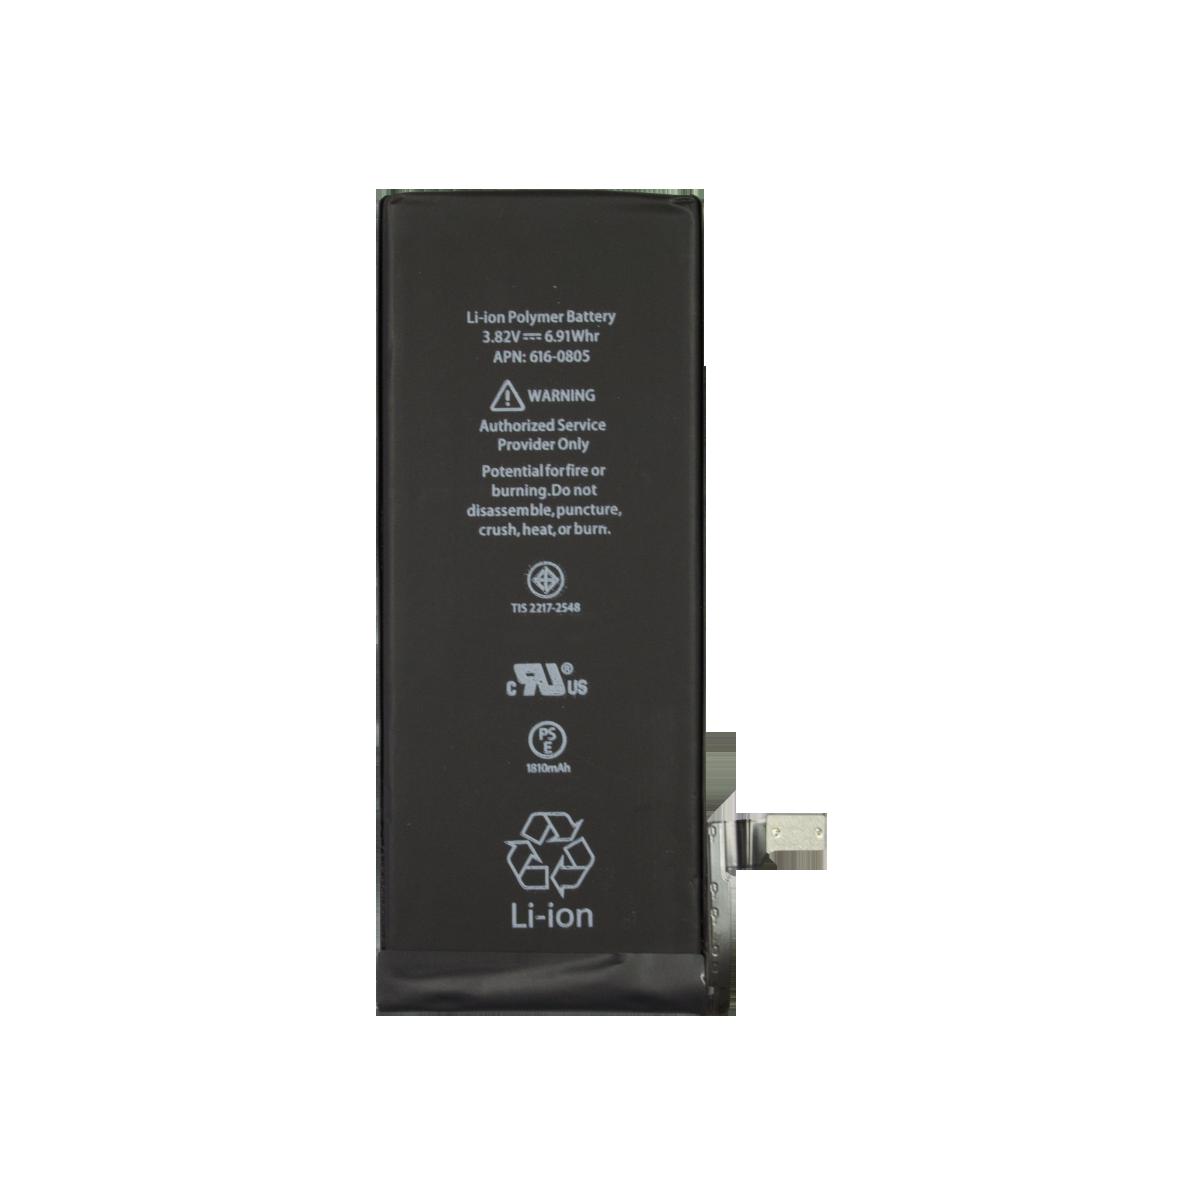 Batterie Li-Ion Polymer 3.82 Volts 6.91 Whr 1810 mAh